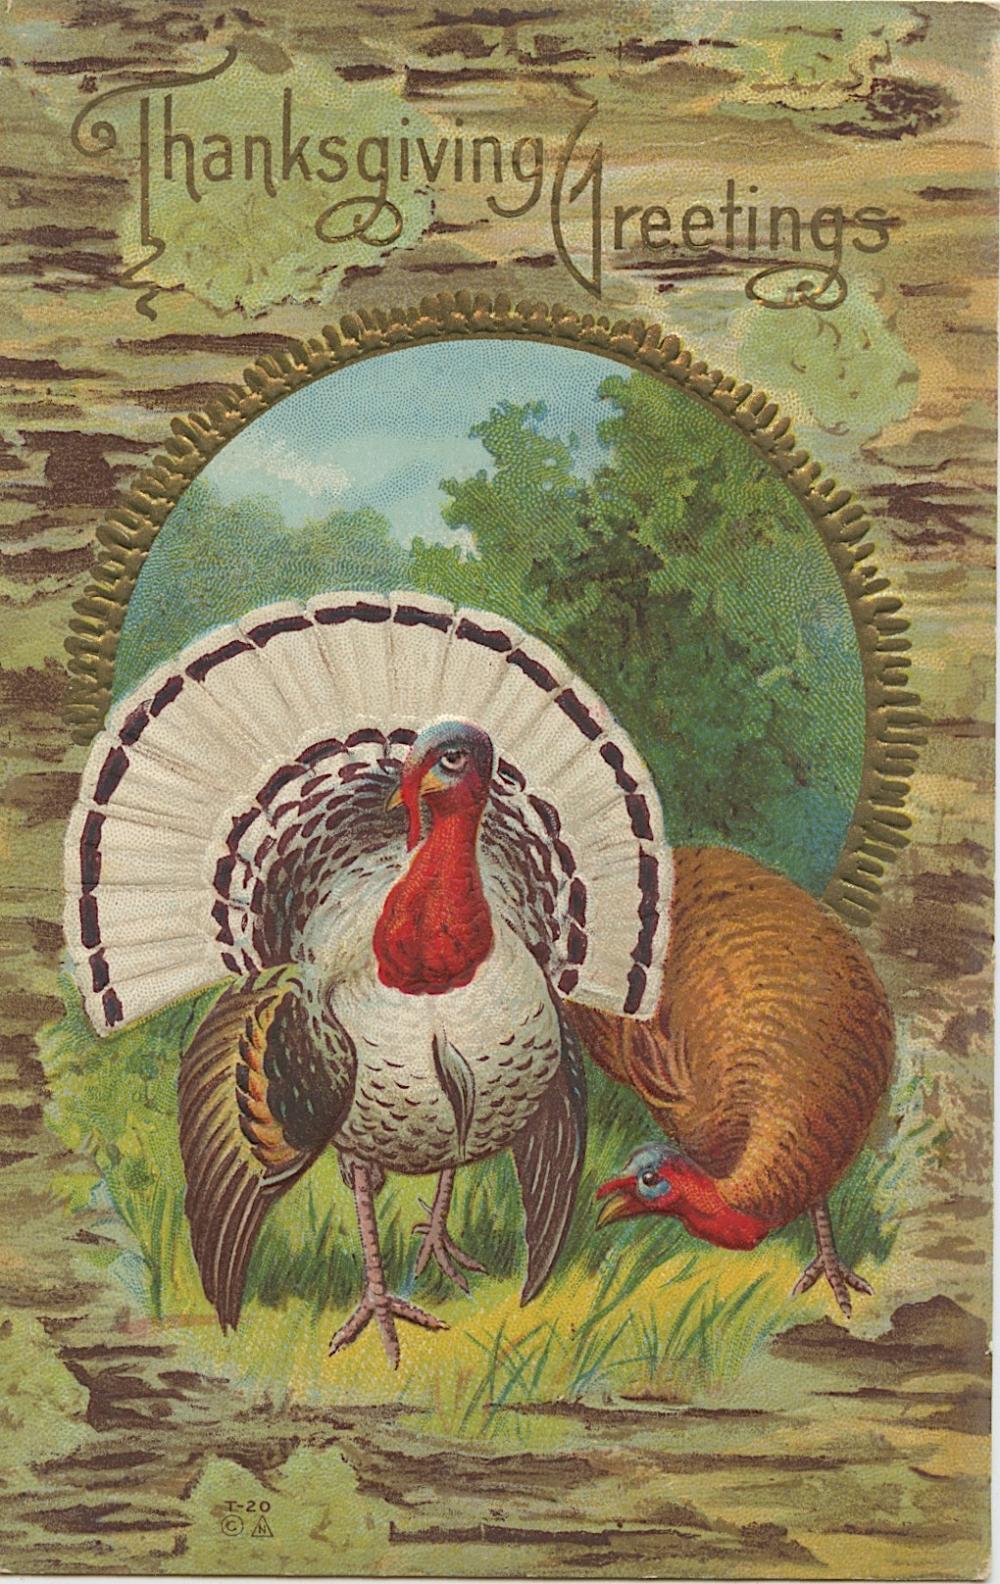 Antique Vintage Rare Postcard Thanksgiving